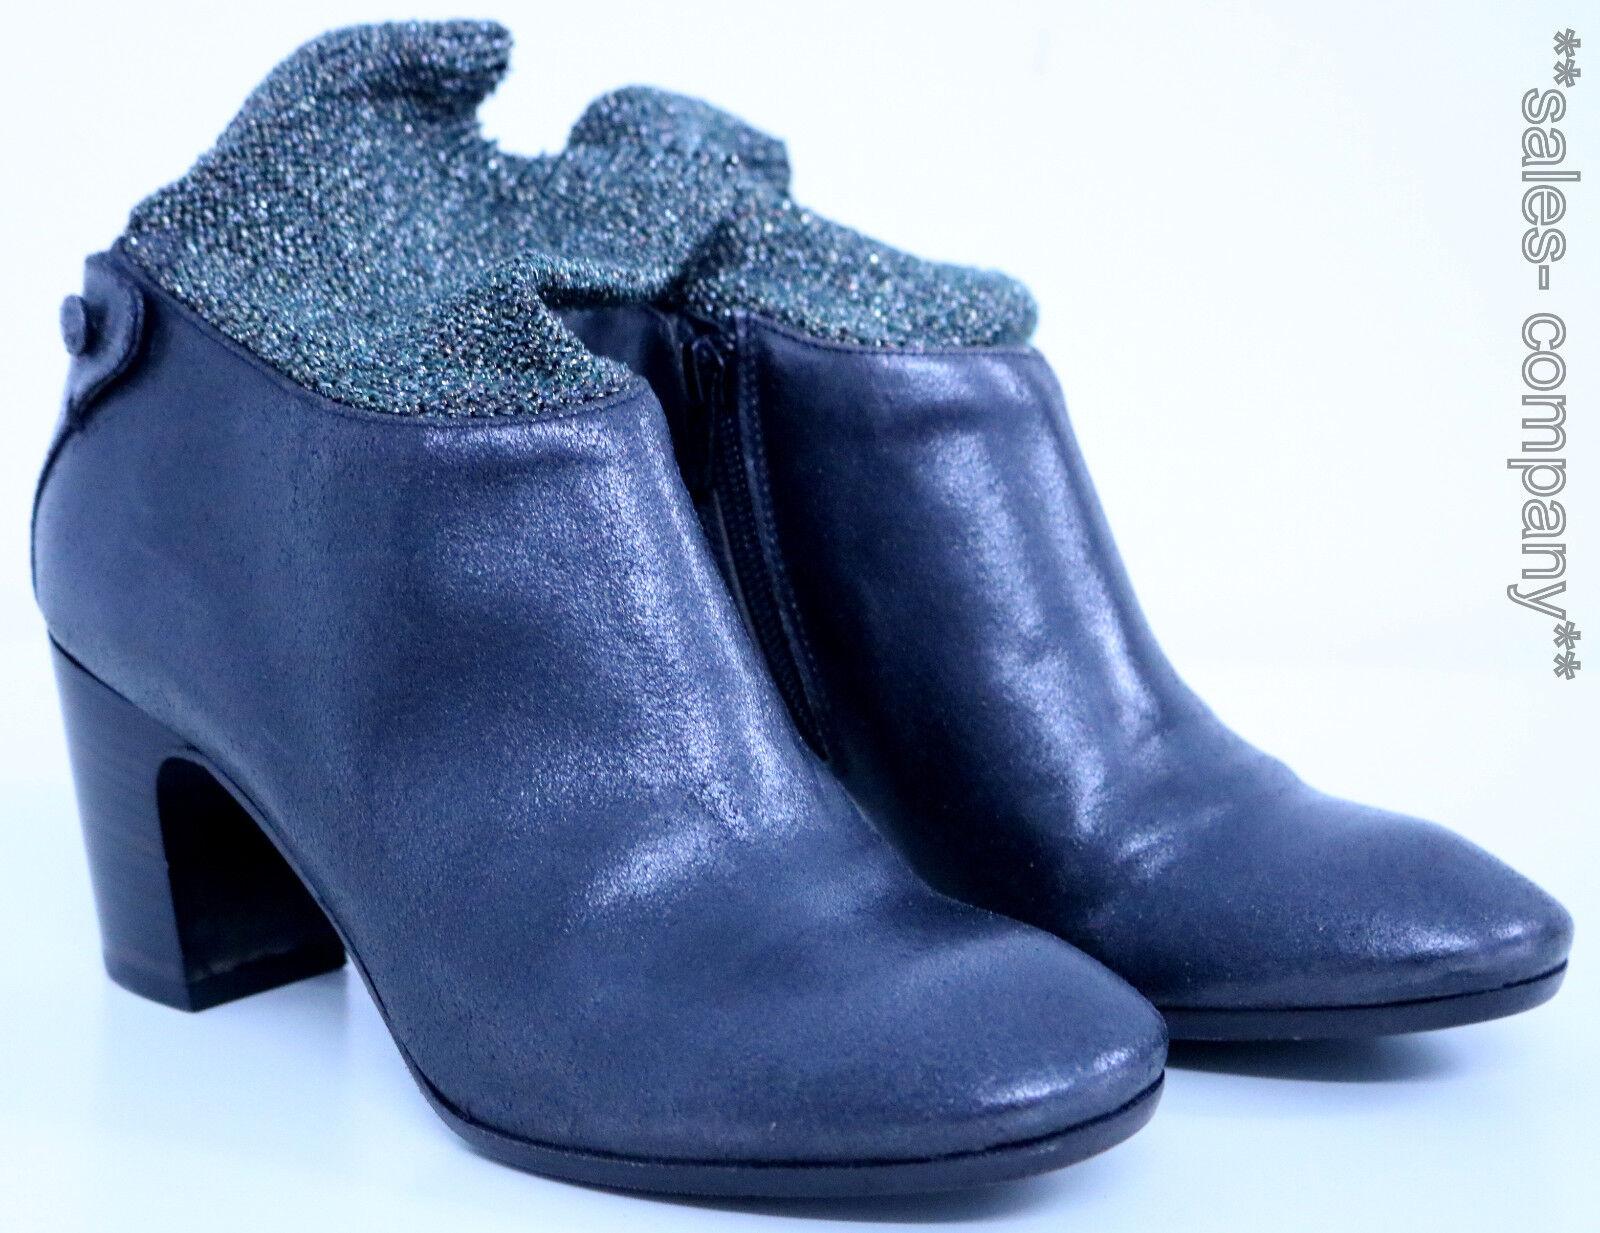 FRU.IT Stiefelette Ankle Bootie Gr.37,5 Leder Braun NEU+OVP LP 279